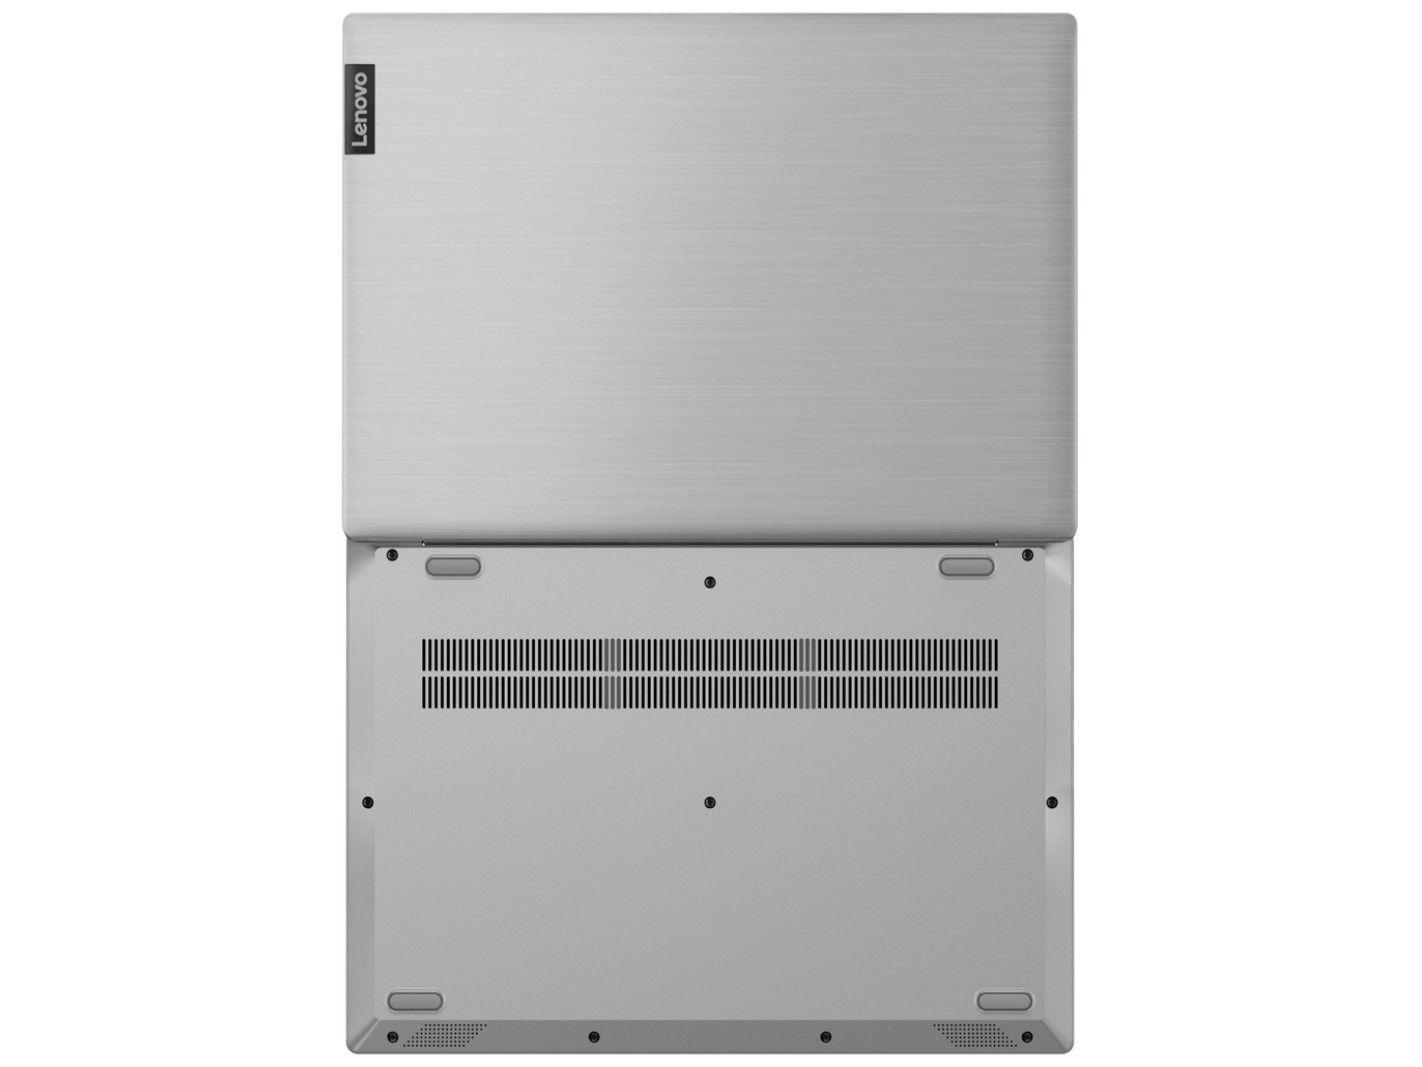 "Notebook Lenovo Ideapad S145, AMD Ryzen 5-3500U, 8GB, 256GB SSD, 15,6"", Windows 10 - 81V70008BR"